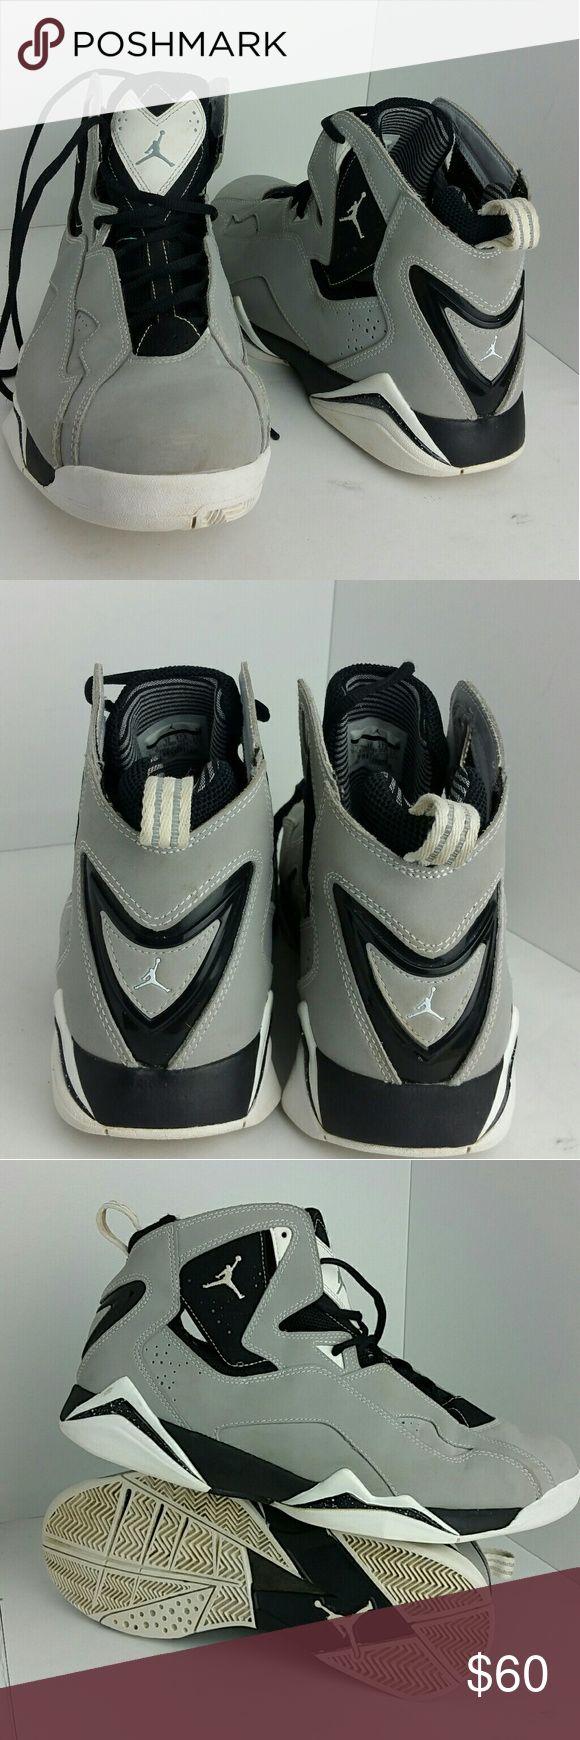 AIR JORDAN TRUE FLIGHT WOLF GREY MEN'S SHOES VERY CLEAN INSIDE-OUT   SKE # PM Air Jordan Shoes Athletic Shoes